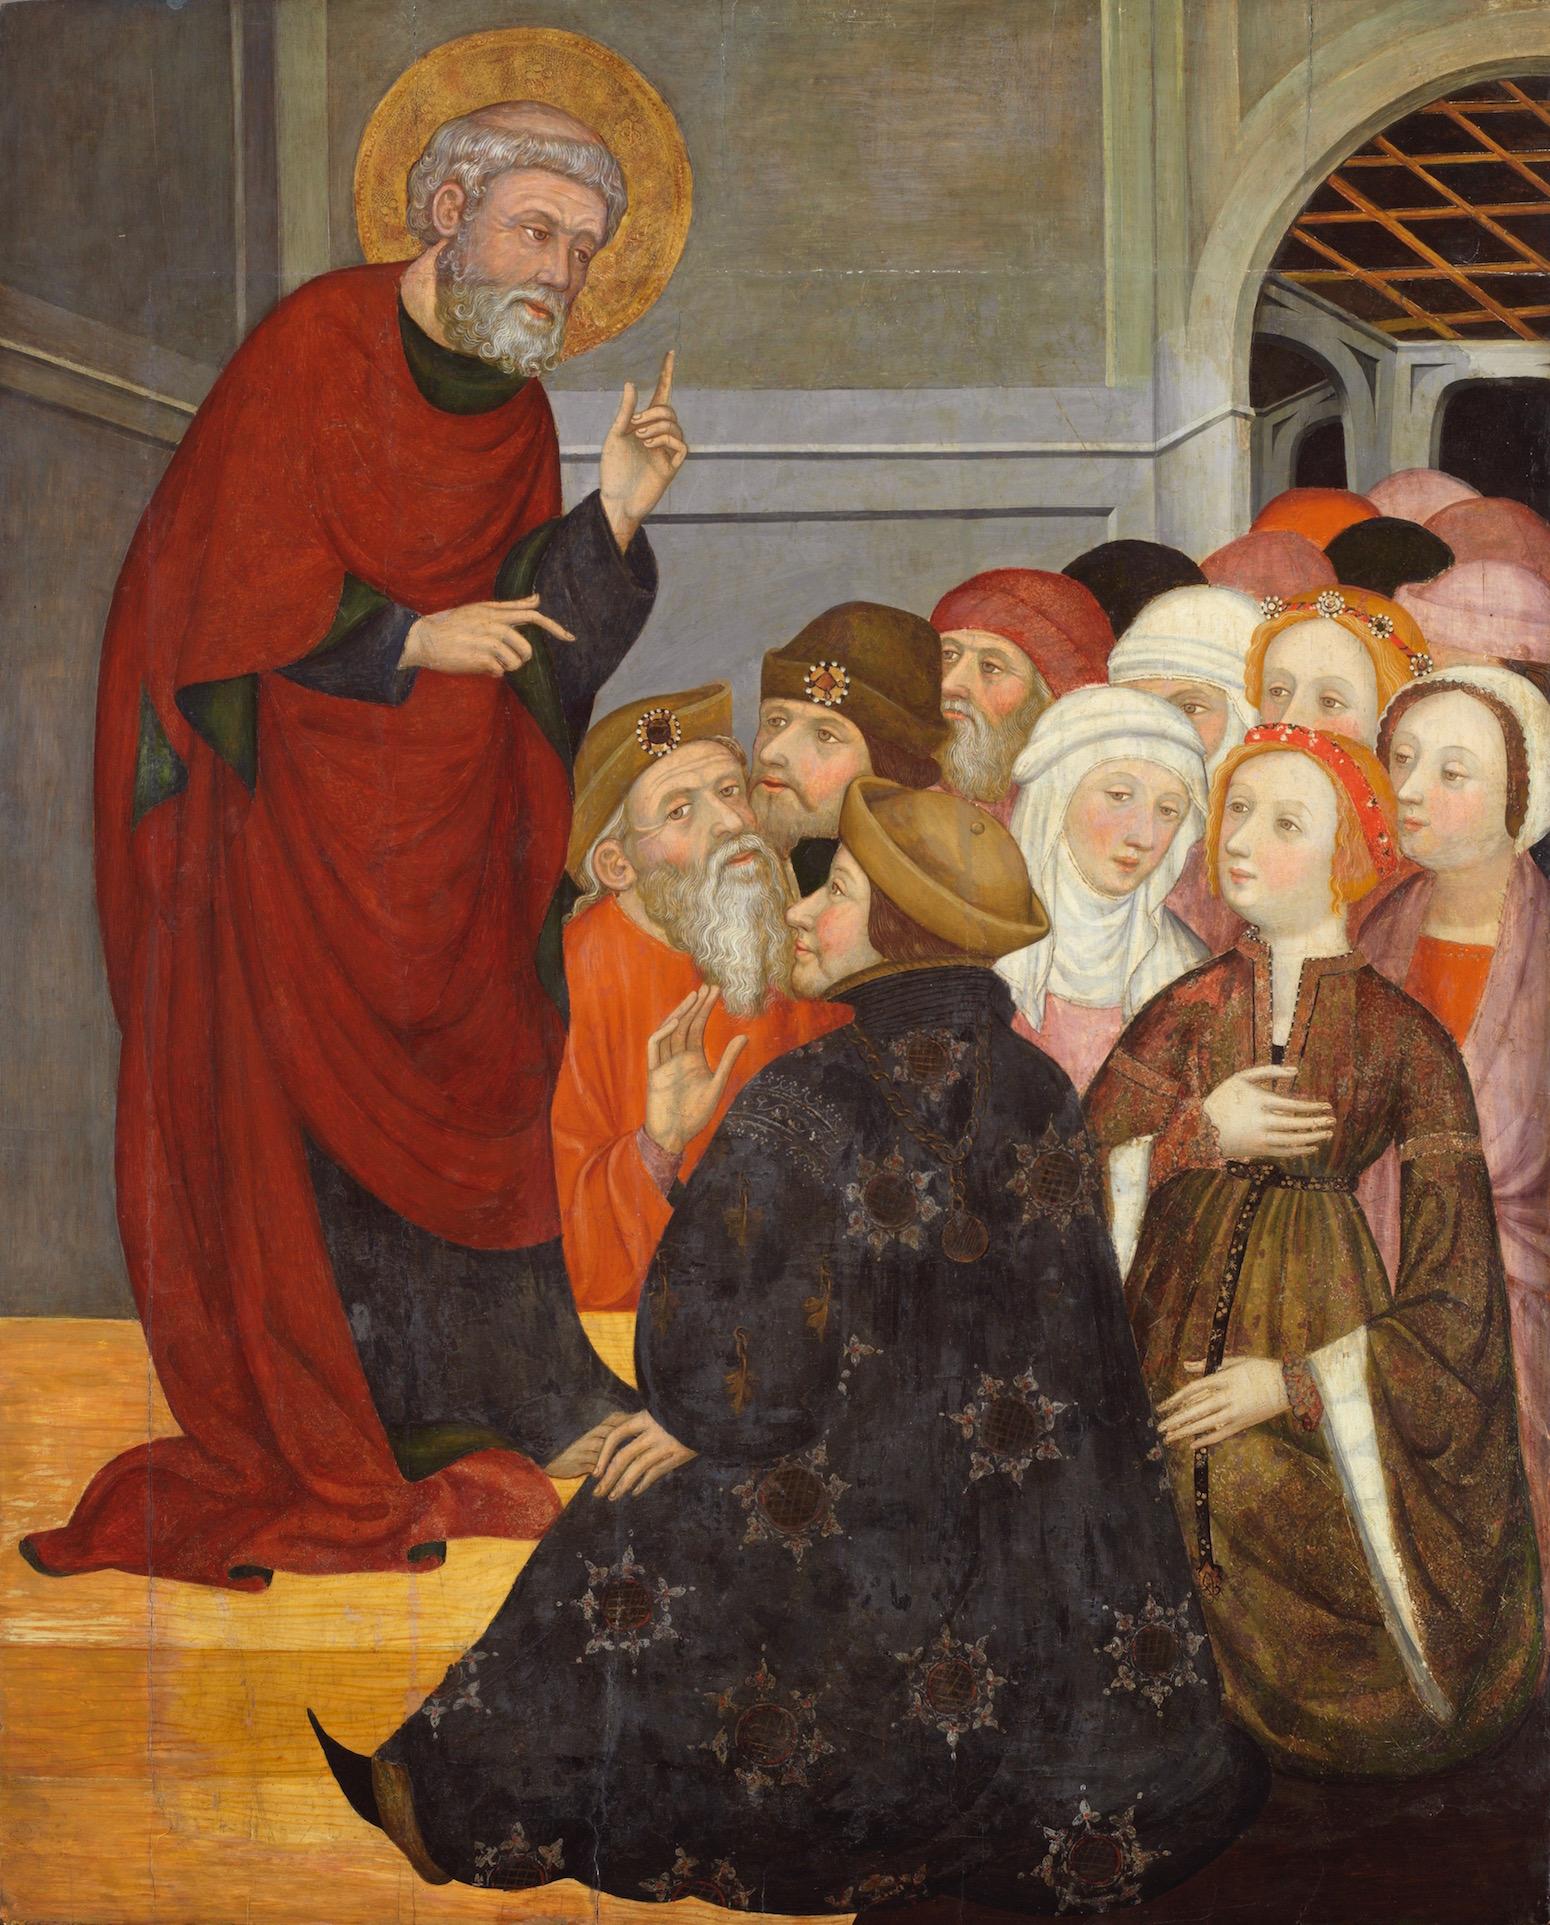 Pedro (Pere) Serra,  St Peter Preaching ,  c . 1400. Tempera on panel, 125 x 101 cm. Bilbao Fine Arts Museum.